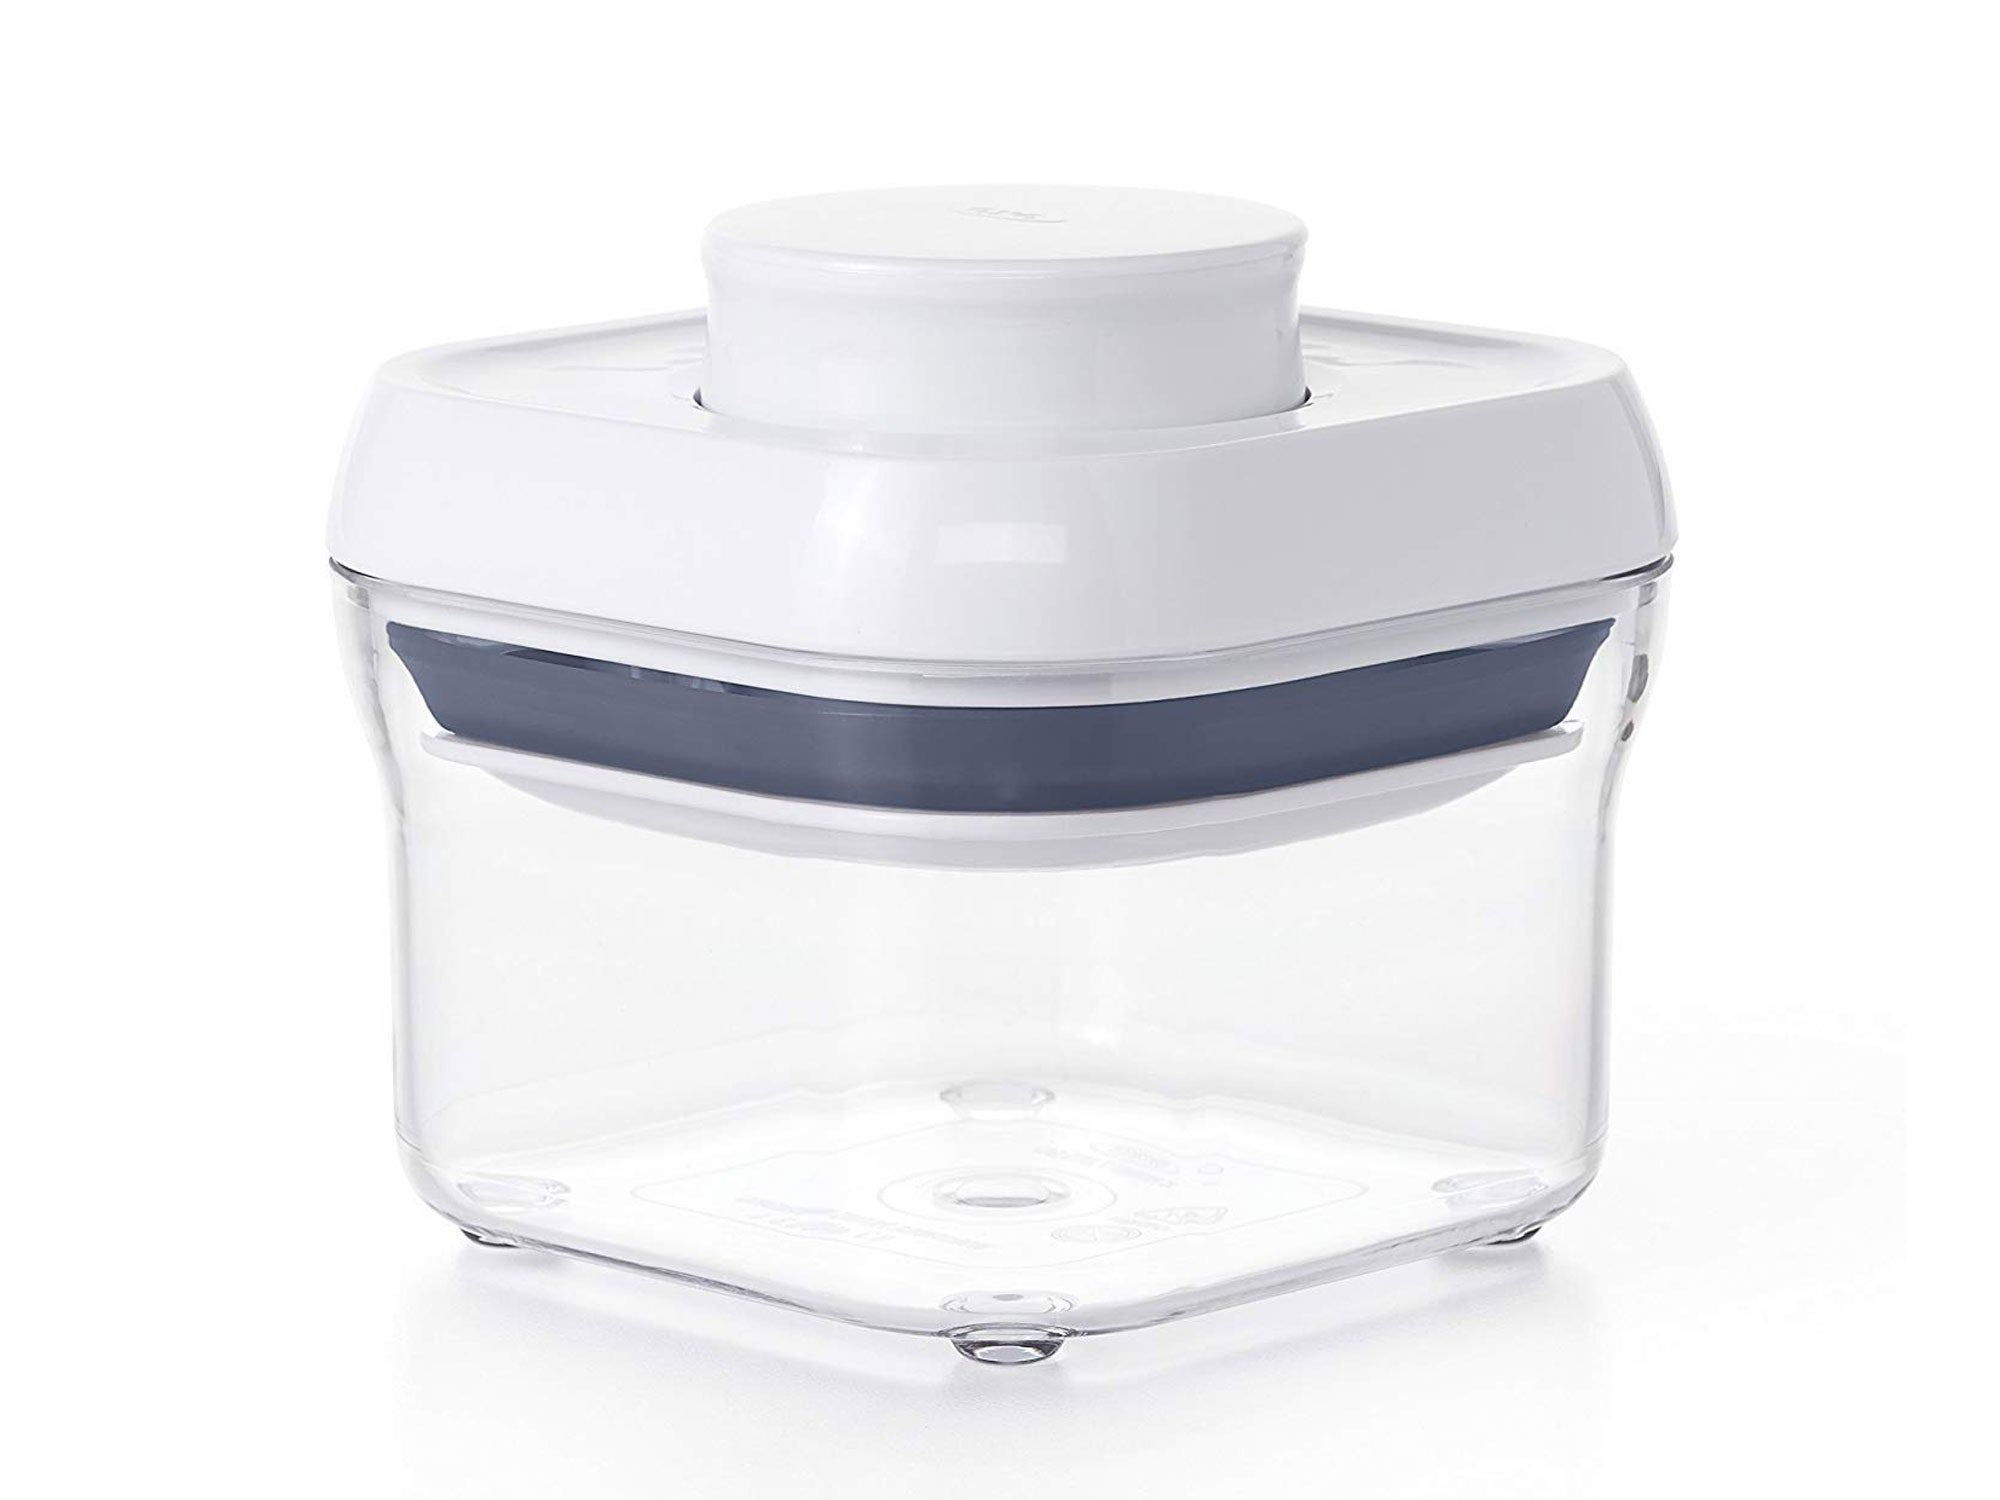 OXO Good Grips Airtight Food Storage